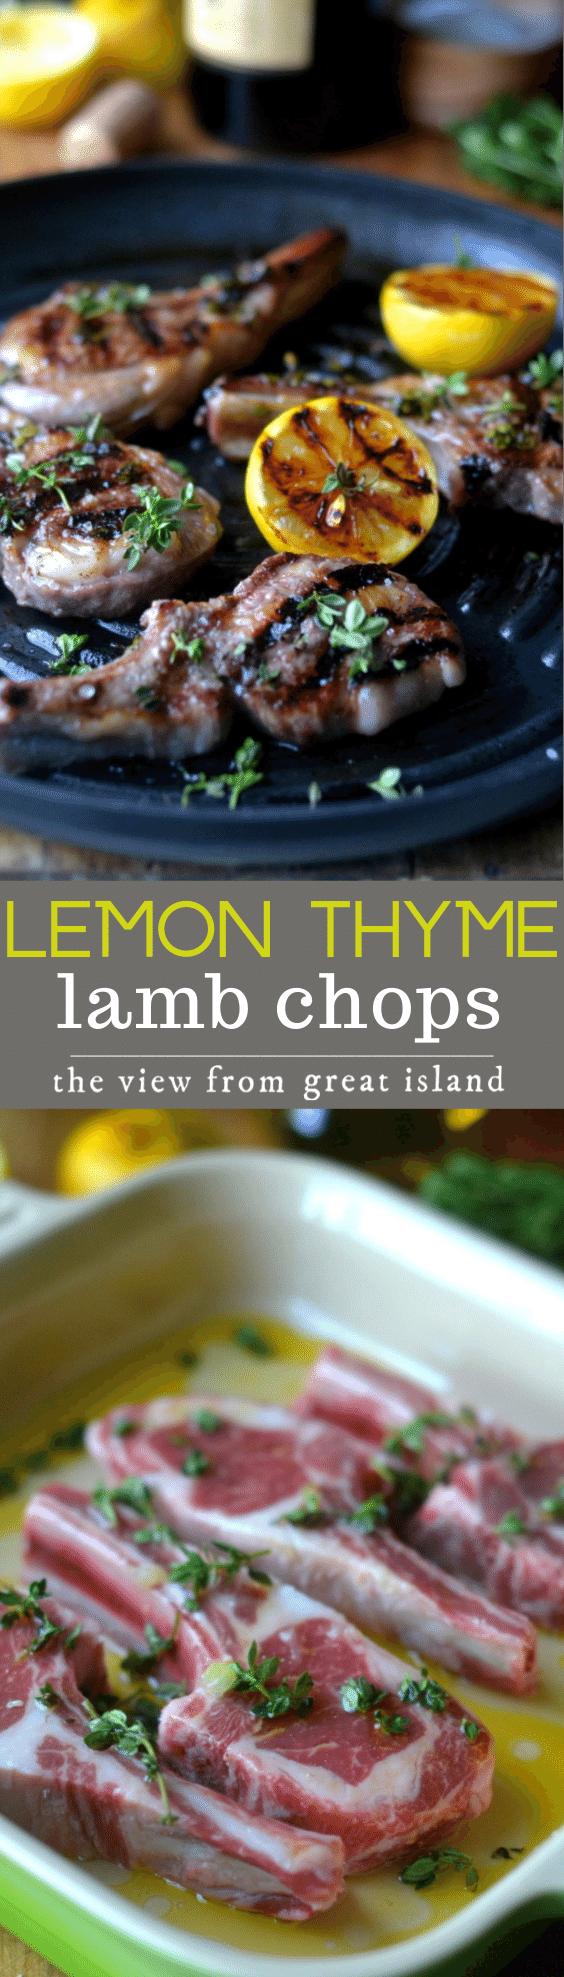 lemon thyme lamb chops pin